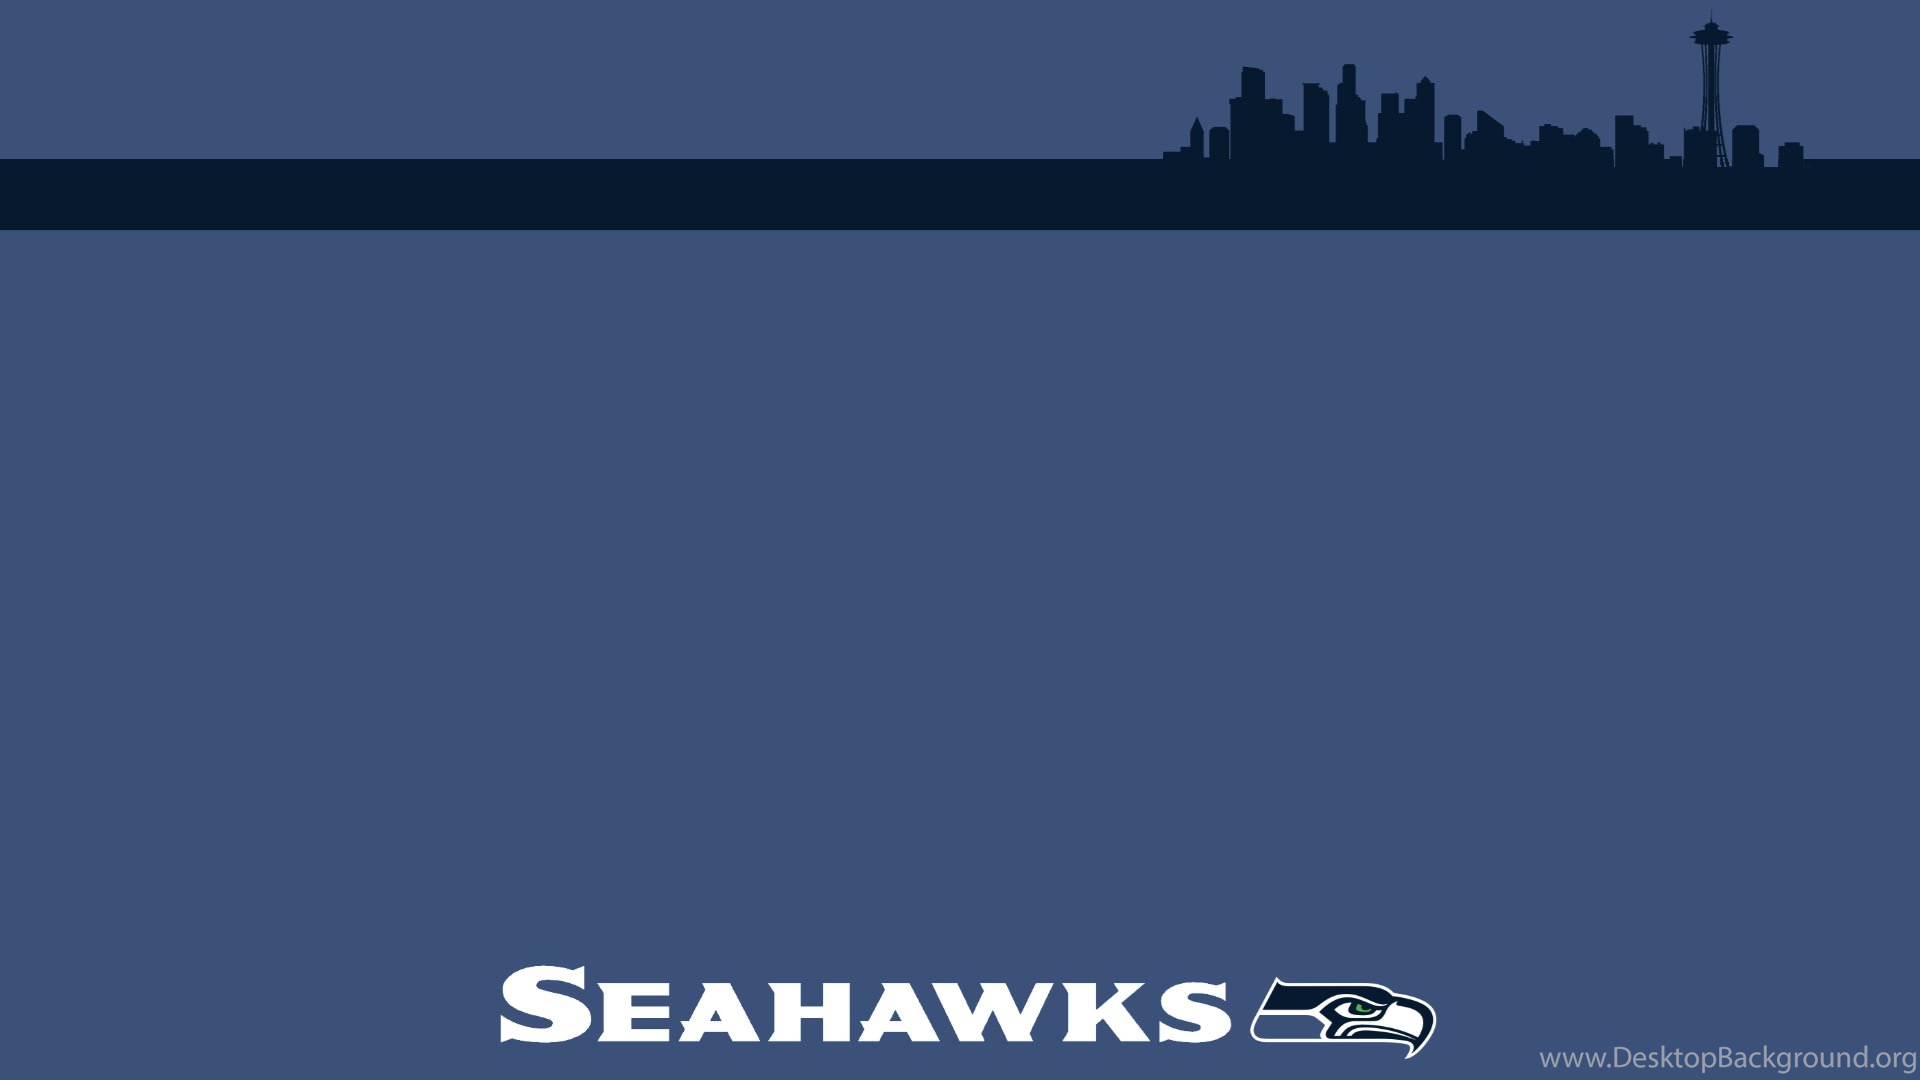 Seahawks Xbox One Theme Xbox One Backgrounds Themer